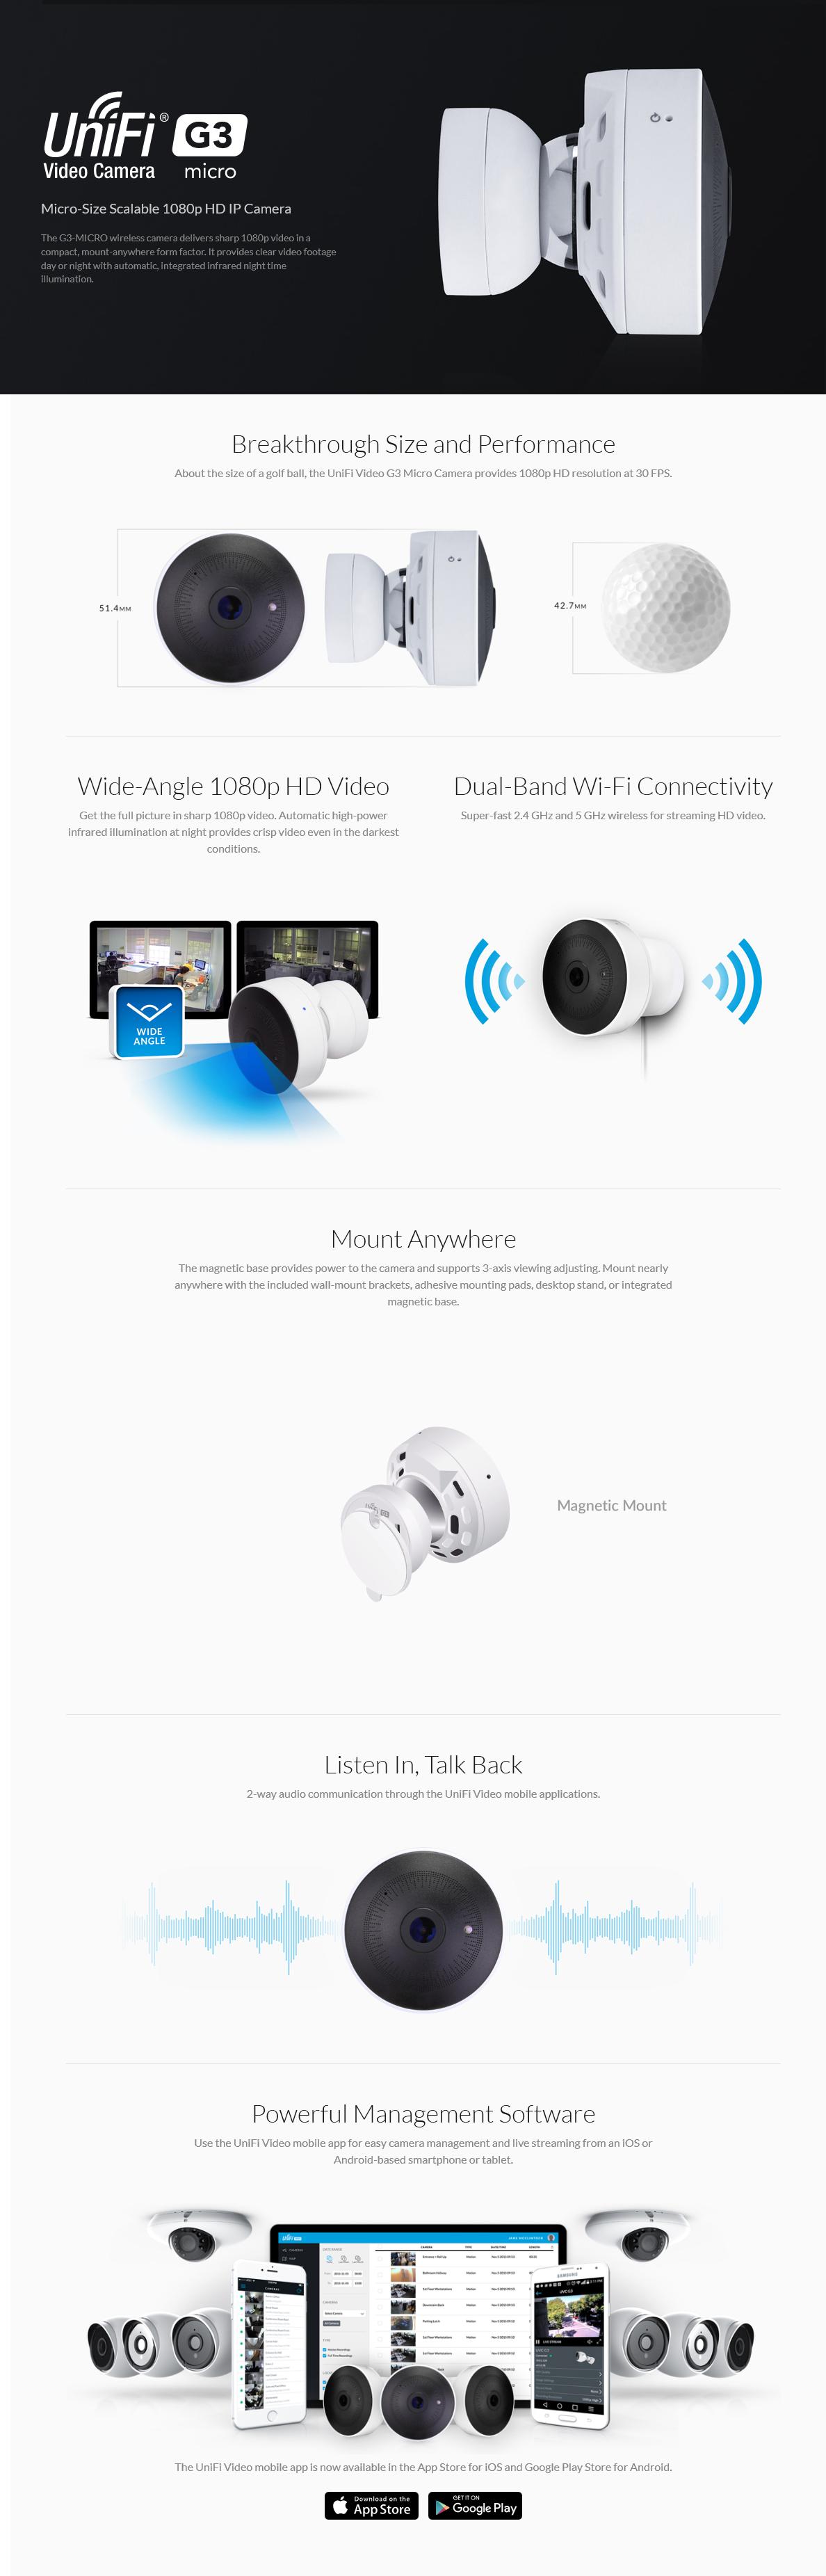 Ubiquiti UniFi G3 Micro 1080p Full HD IP Surveillance Video Camera